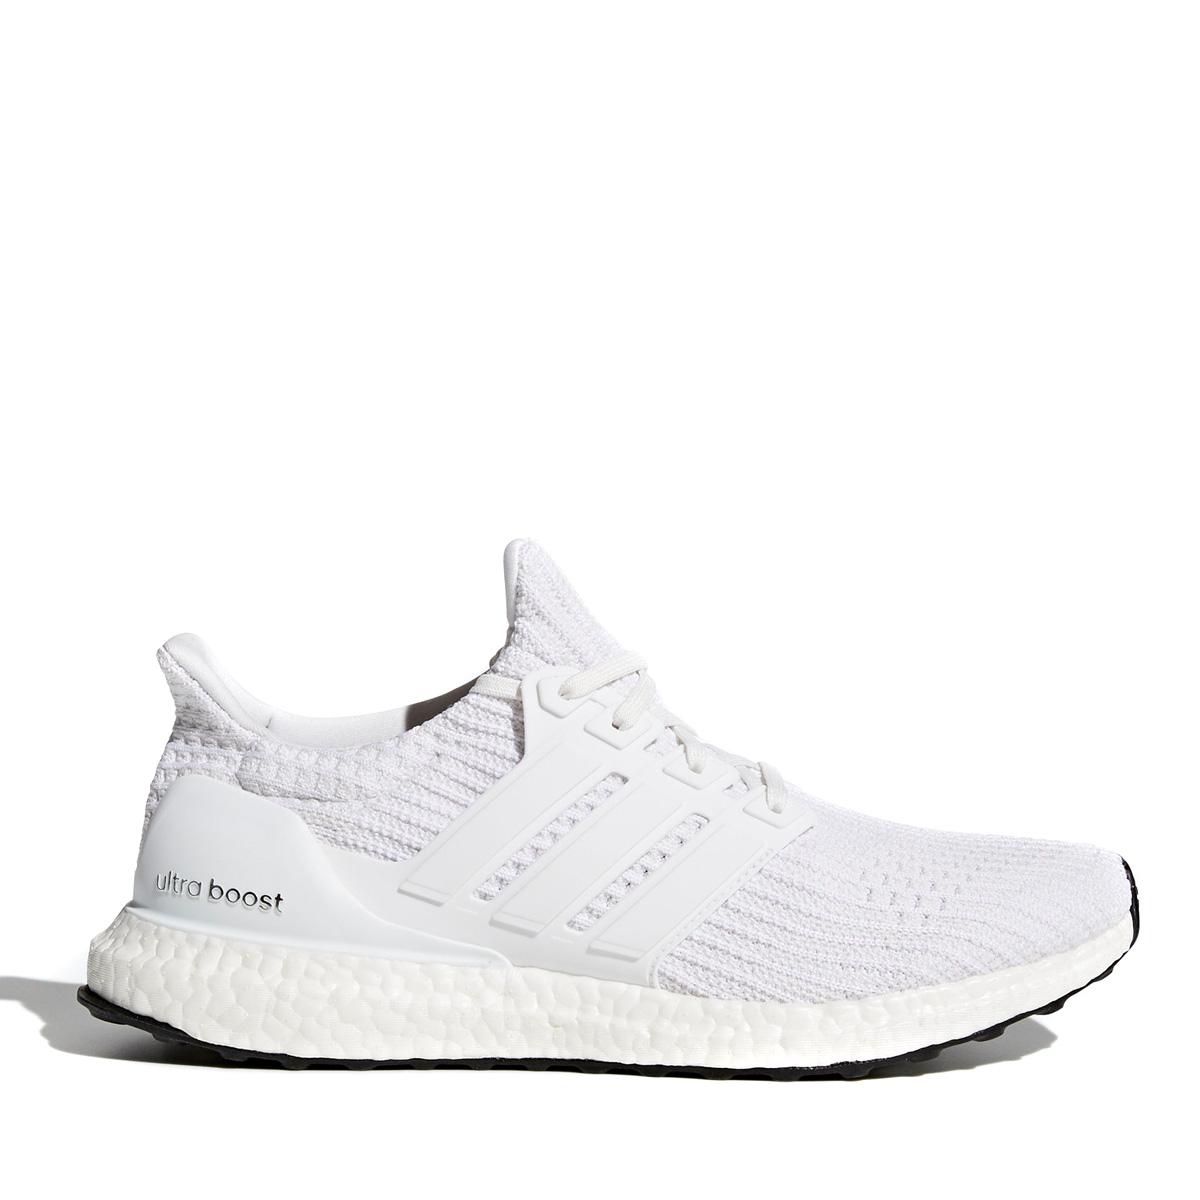 adidas Originals UltraBOOST(アディダス オリジナルス ウルトラブースト)Running White/Running White/Running White【メンズ スニーカー】18SS-I